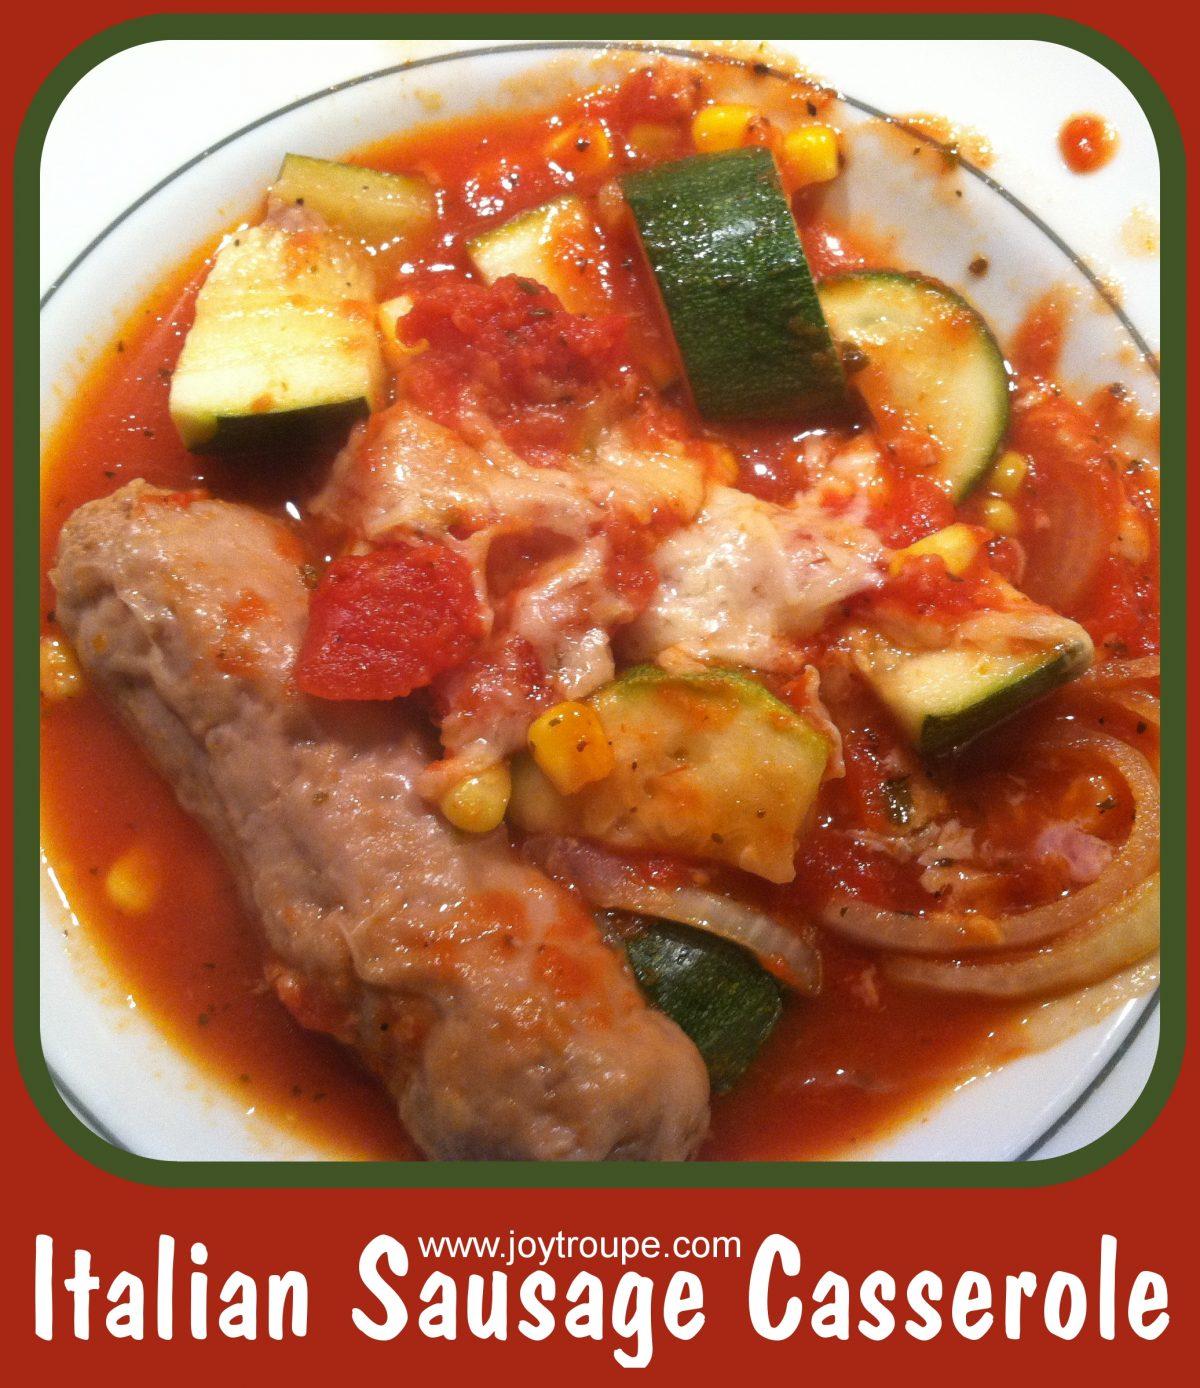 Lower Carb Italian Sausage Casserole - Joy Makin Mamas